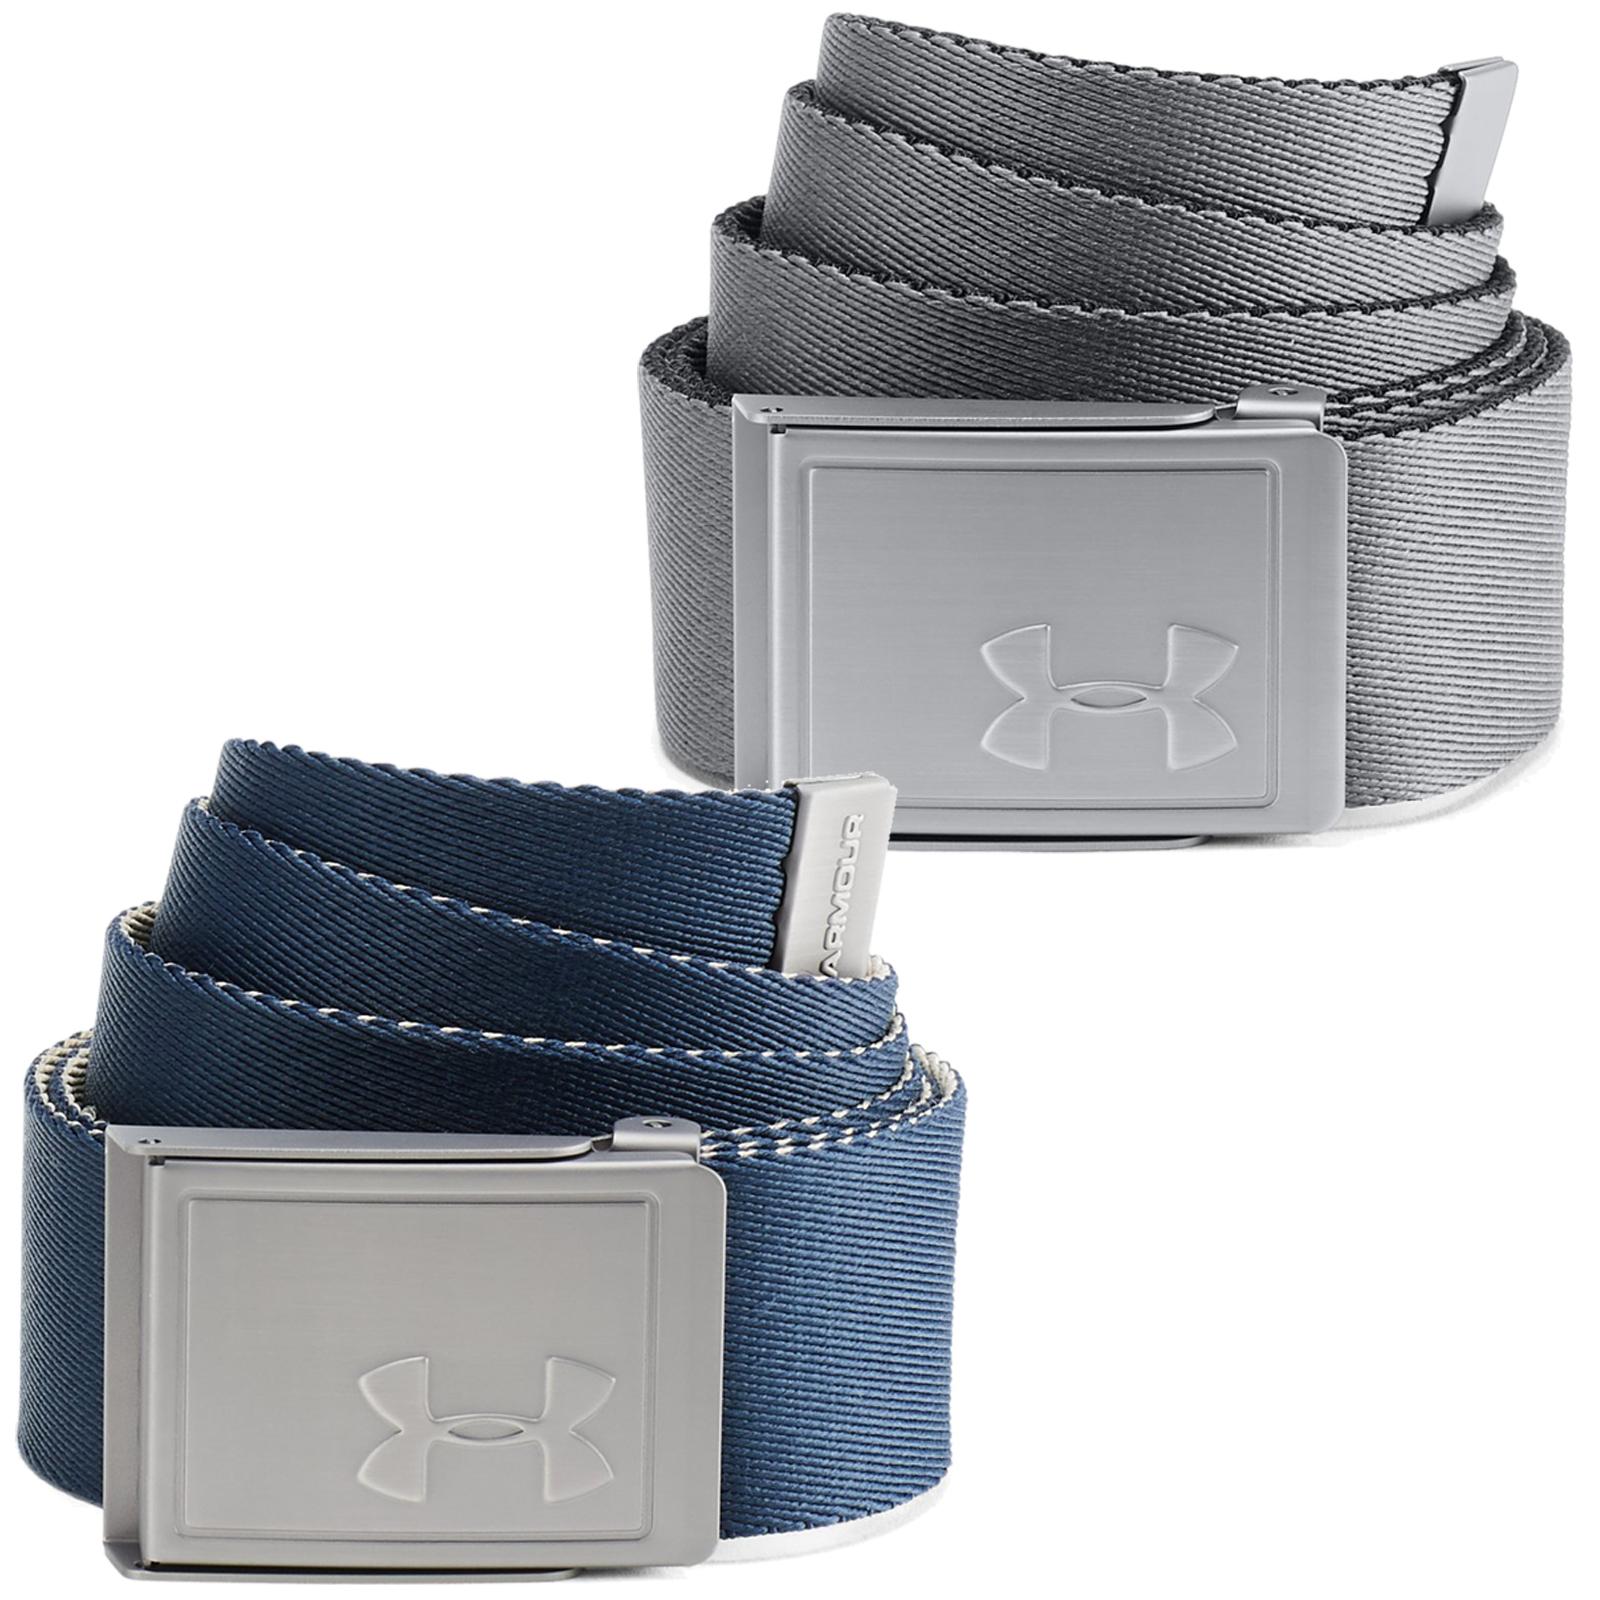 Under Armour Golf Reversible Webbing 2.0 Mens Belt  - Zinc Grey